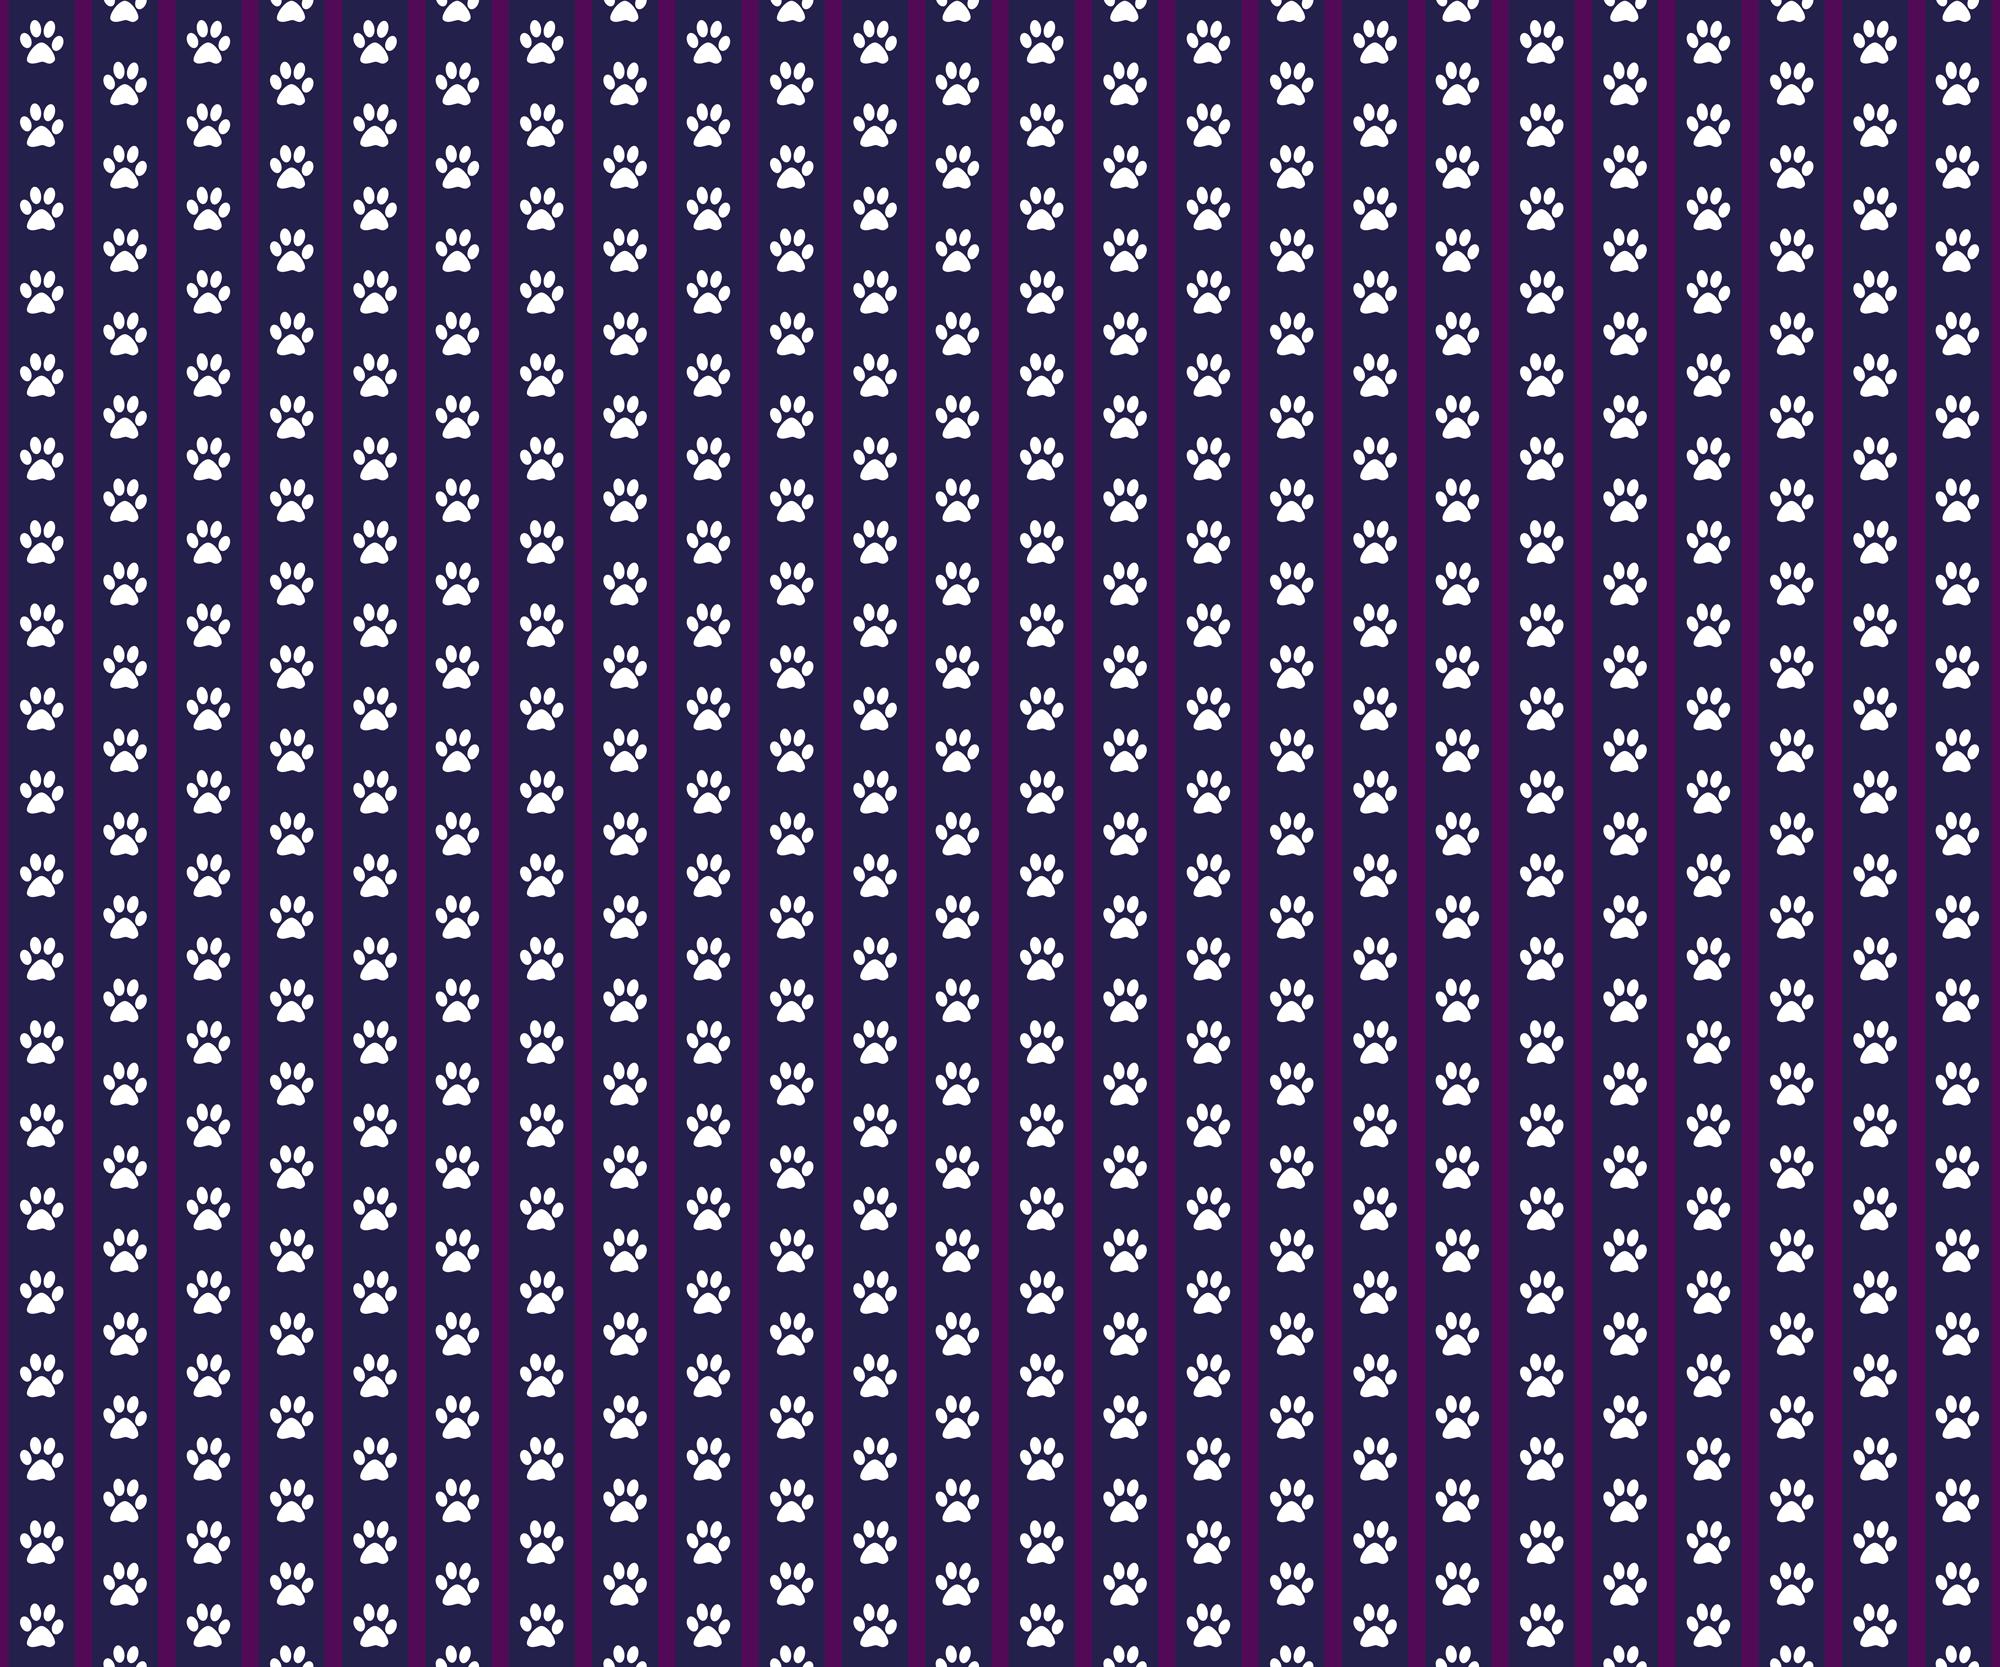 Doggy Paw Print Pattern By Balkmunk On Deviantart Upload only your own content. deviantart